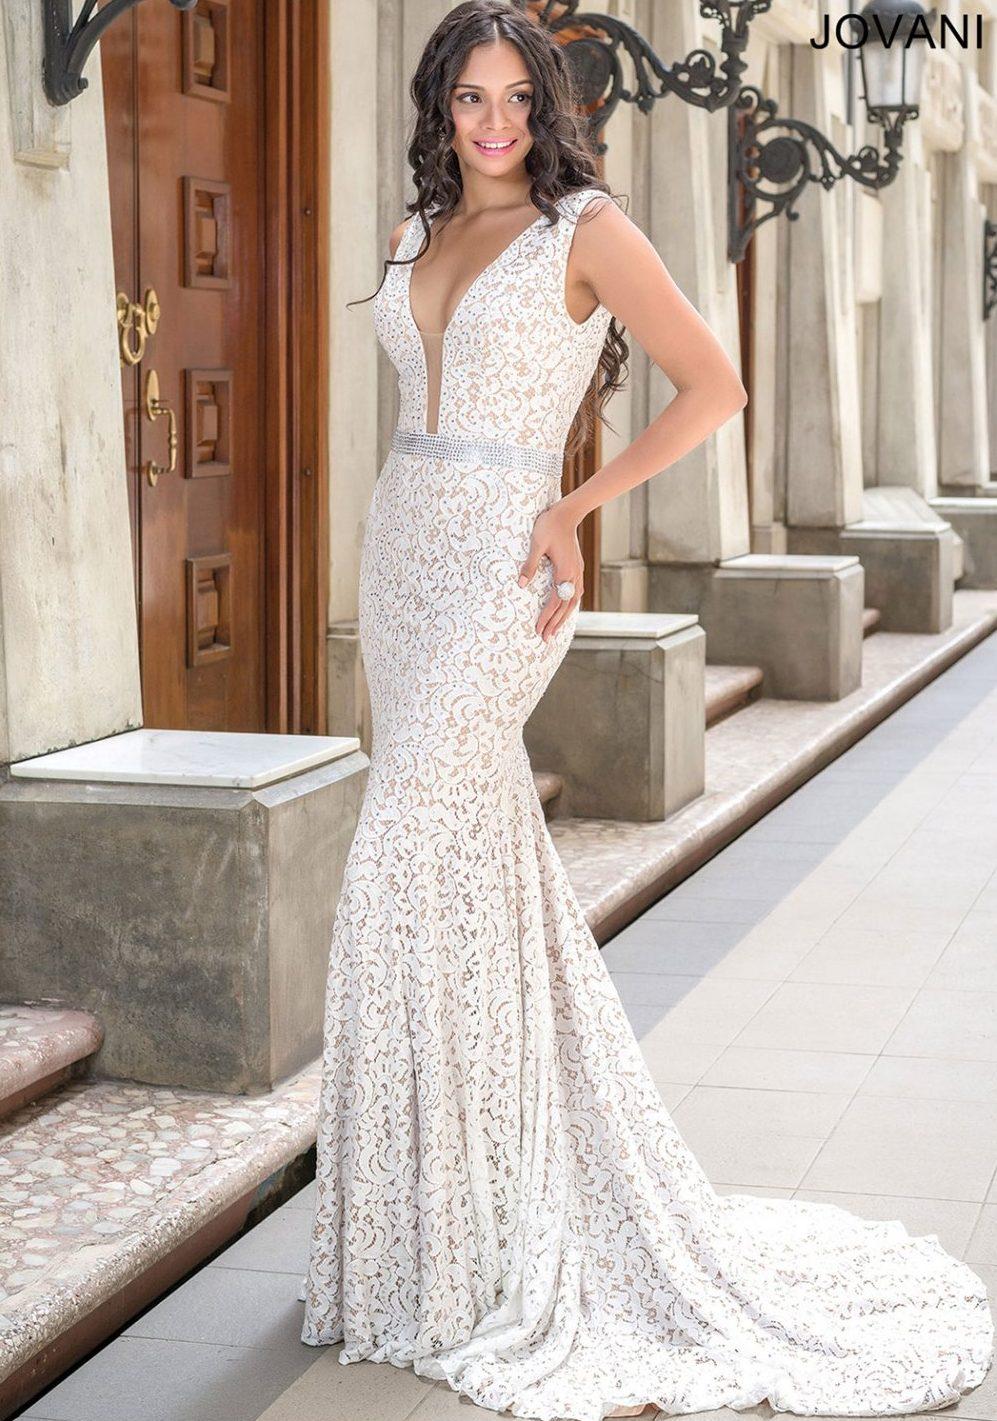 Jovani 29056 Prom Dress